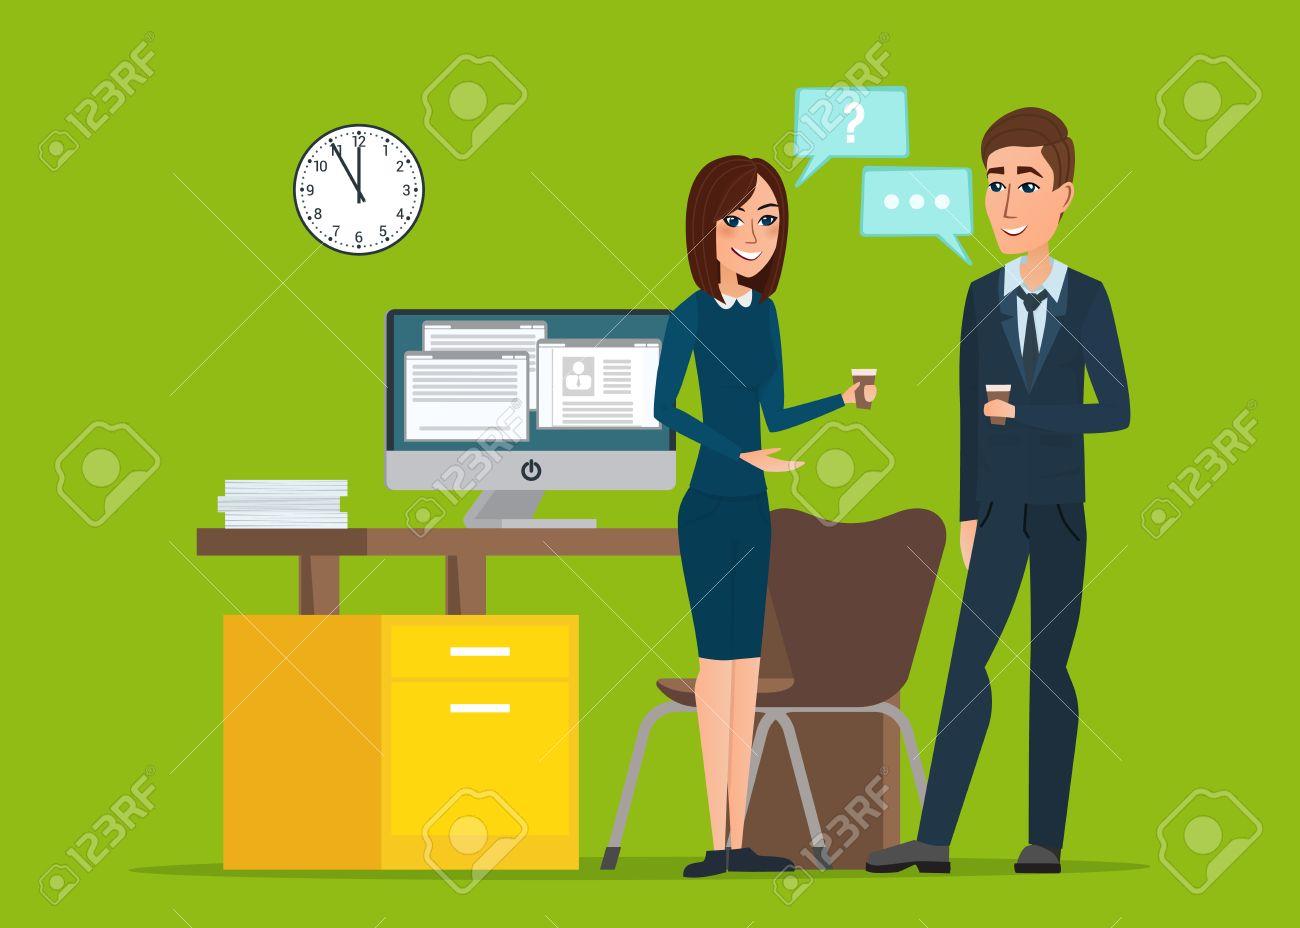 f44006ed5b22 Girl and man businessmen talking office. Job Interview Task Conversation  Desk Working Computer. Business